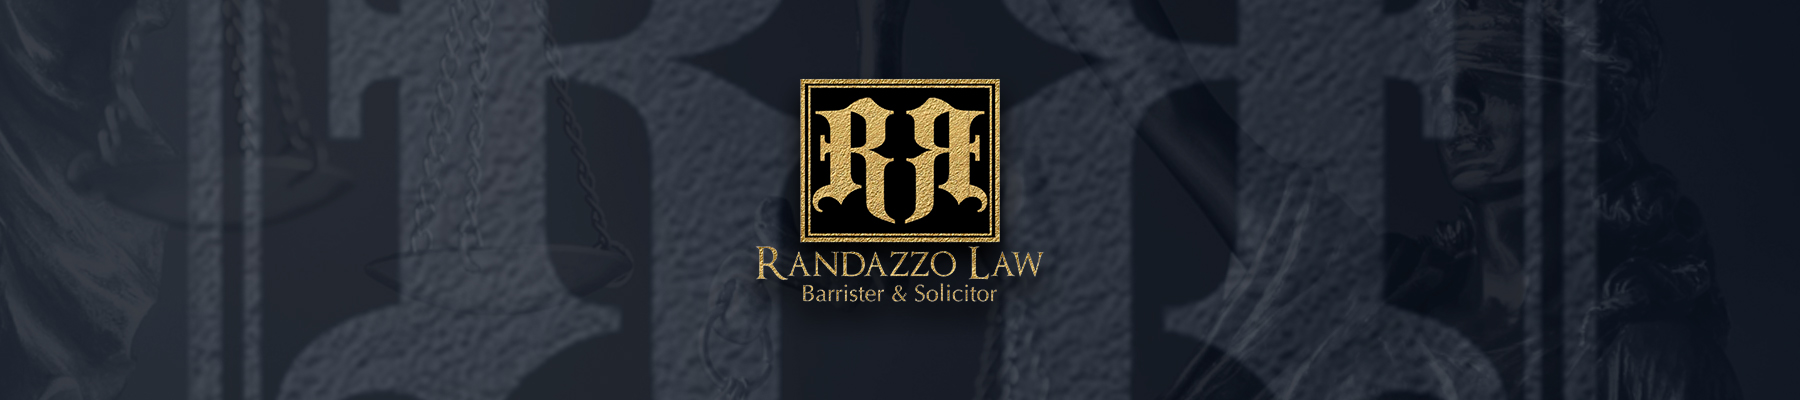 Randazzo Law